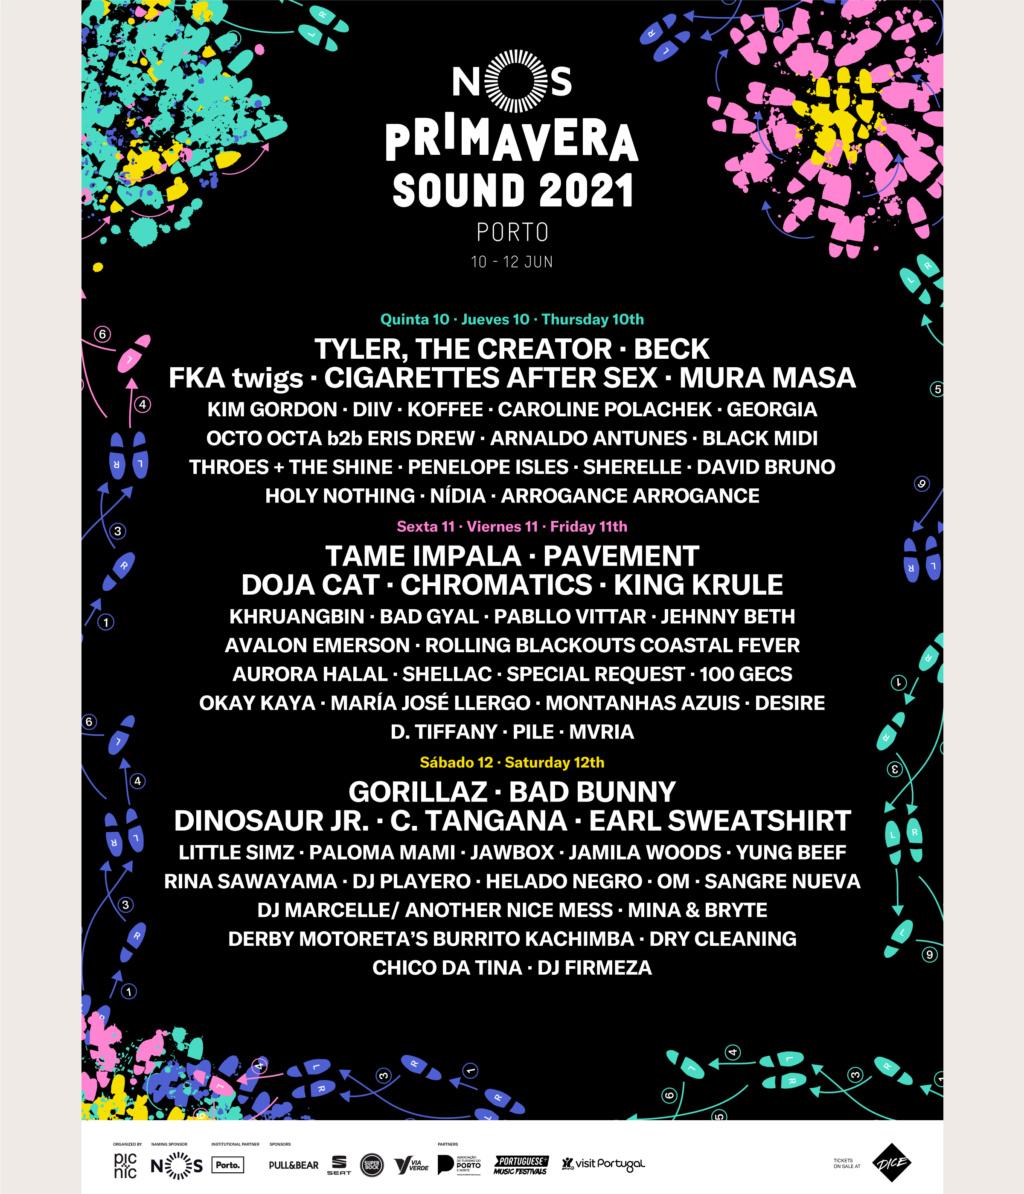 NOS Primavera Sound 2020 - Página 2 H90f9s10